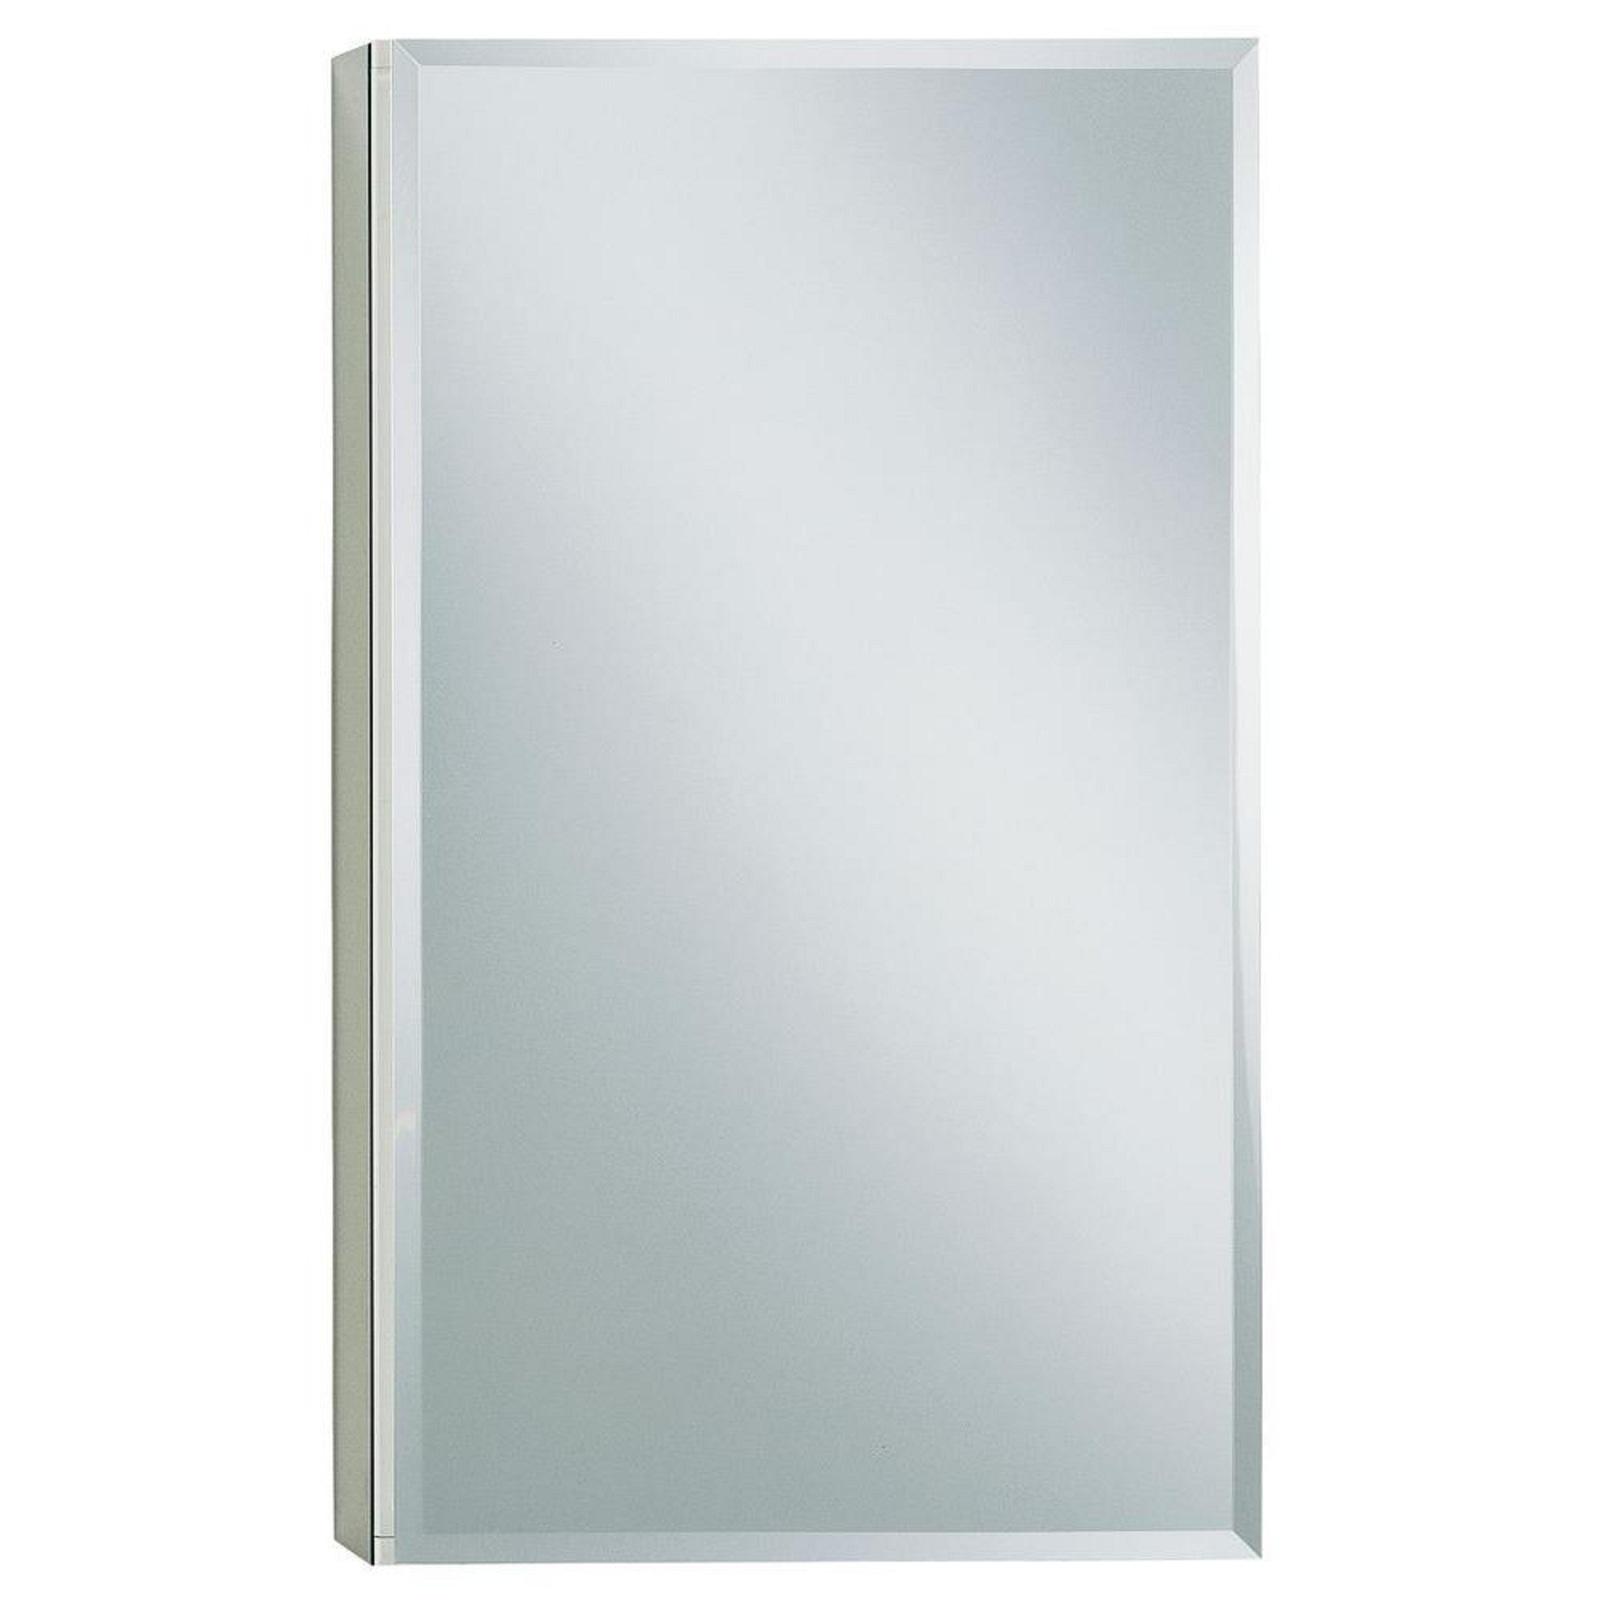 Medicine Storage Cabinet with Mirrored Interior Aluminum Toiletries Makeup Rack